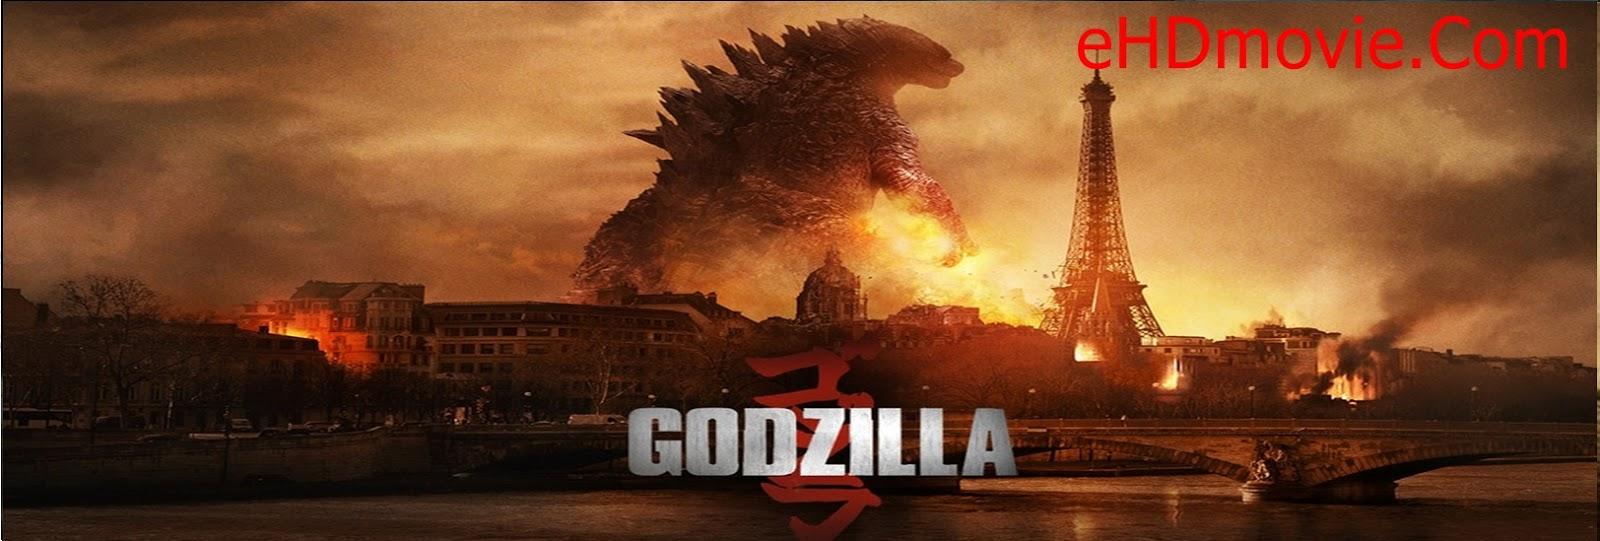 Godzilla 2014 Full Movie Dual Audio [Hindi – English] 720p - 480p ORG BRRip 400MB - 1GB ESubs Free Download